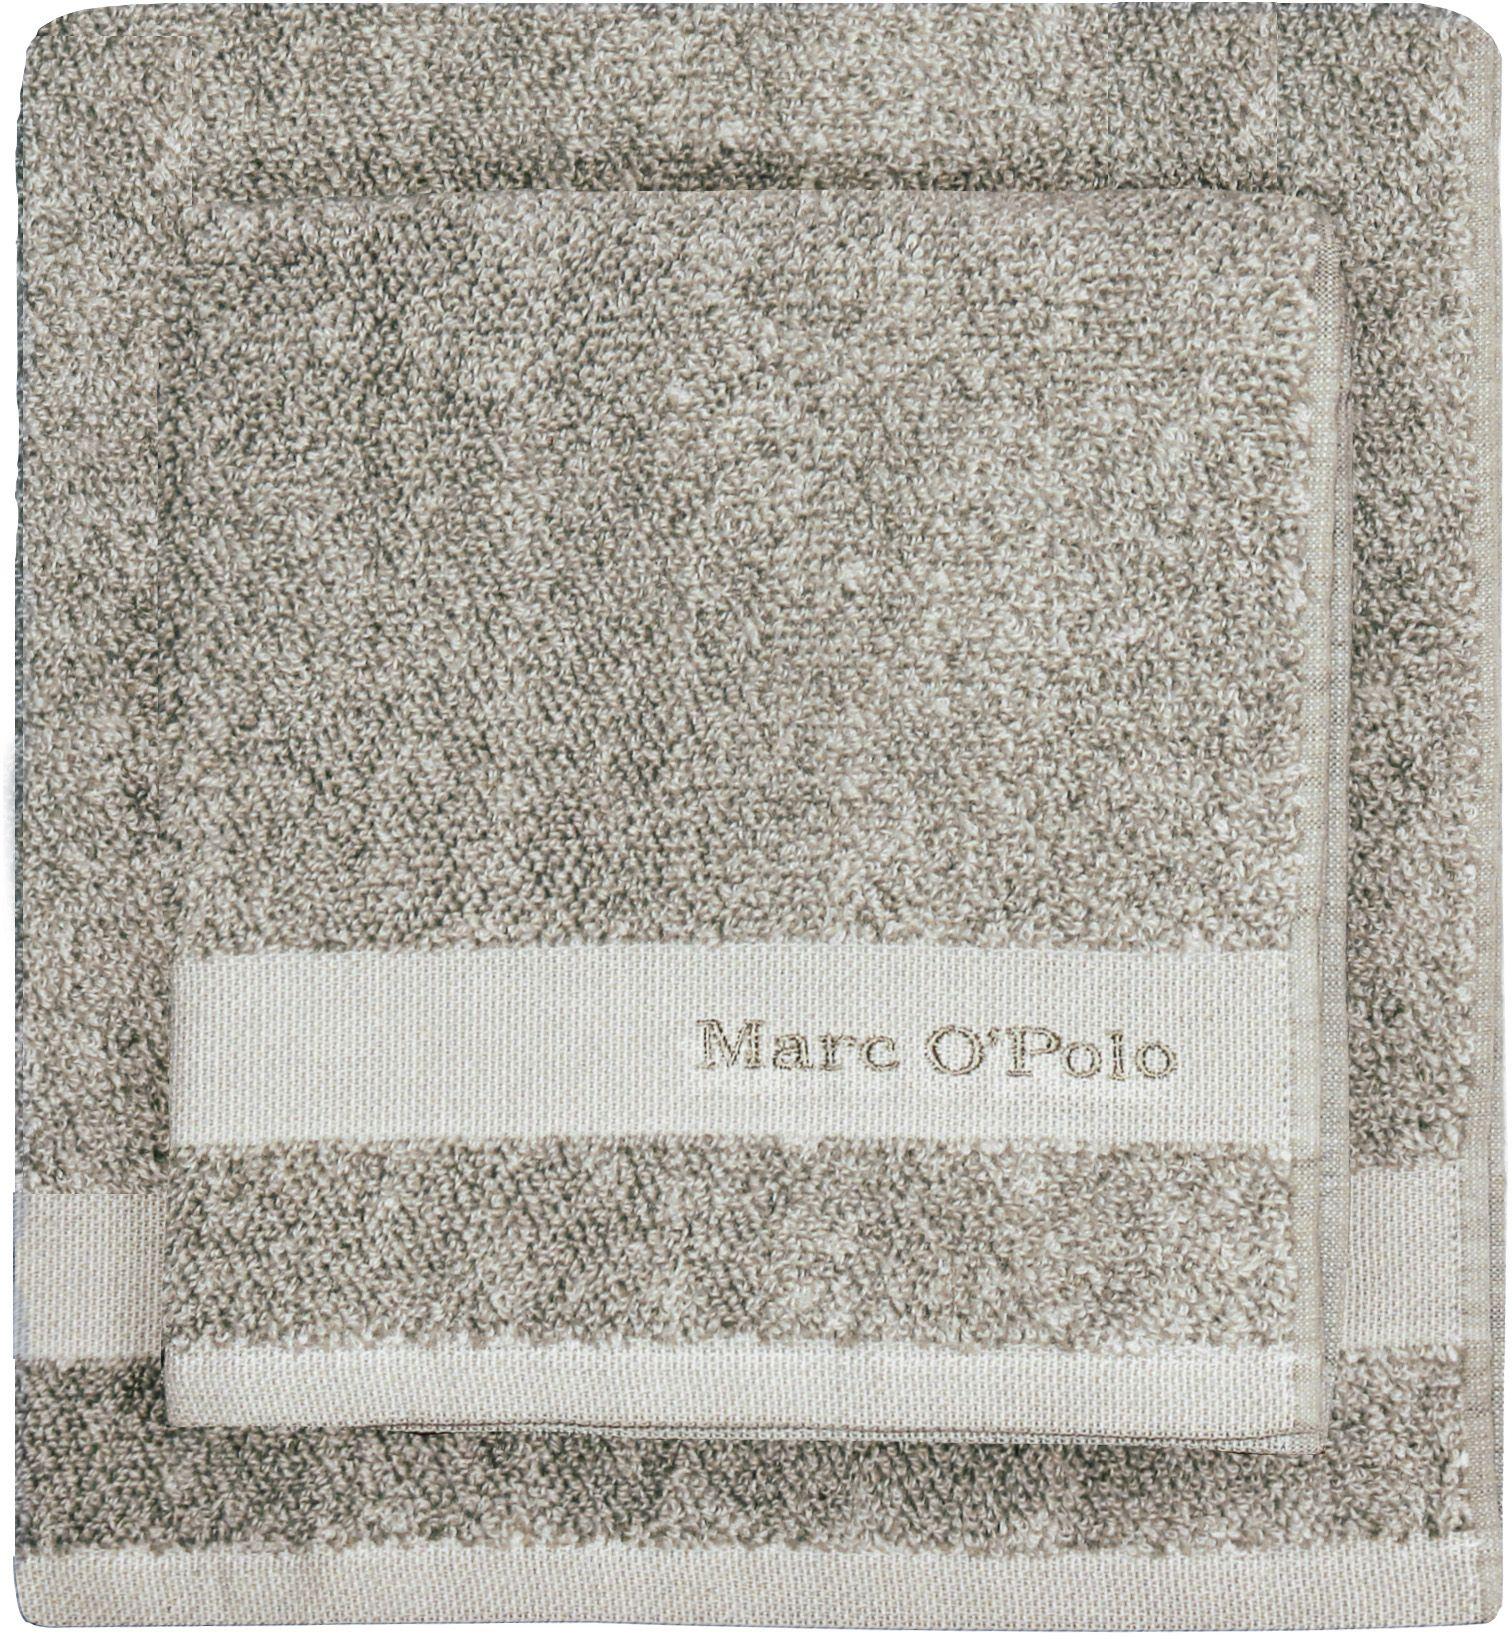 MARC OPOLO HOME Badetuch, Marc O'Polo Home, »Melange«, mit Logostickerei